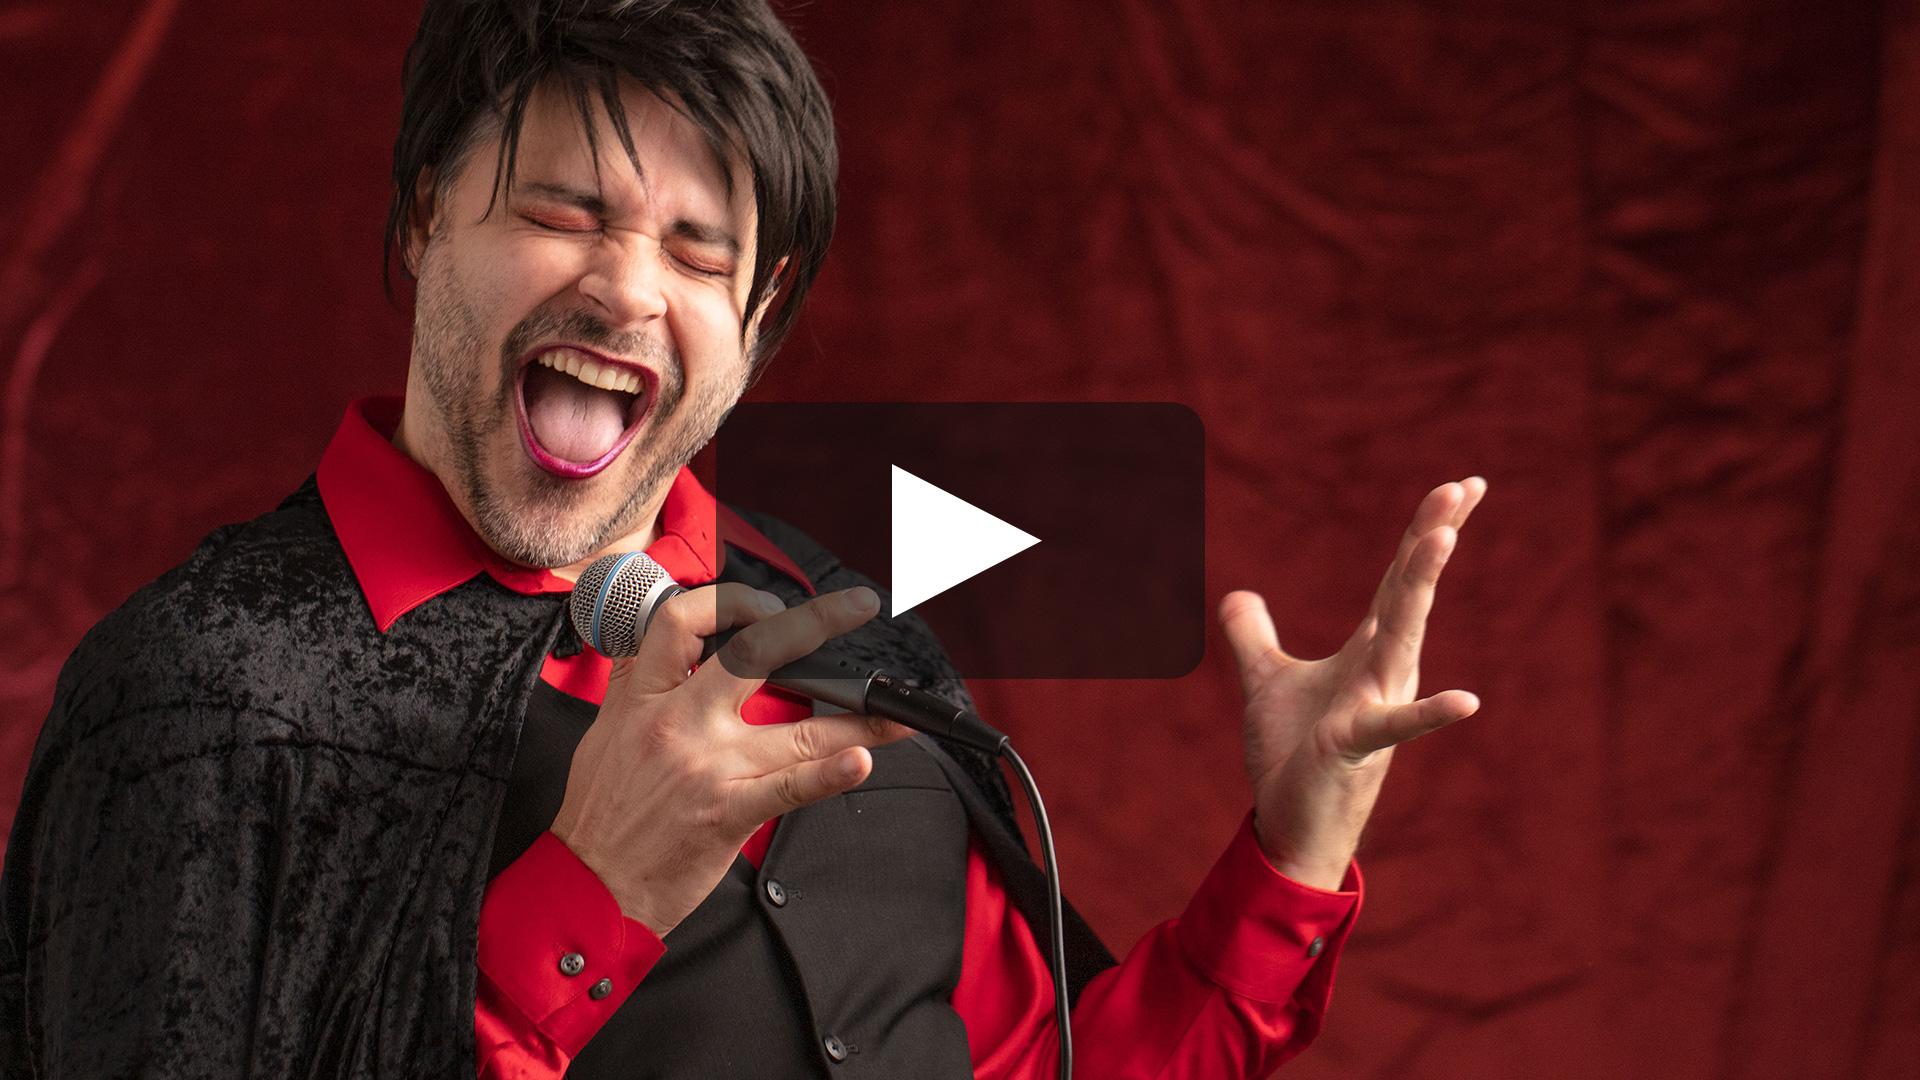 Count Jazzula song medley